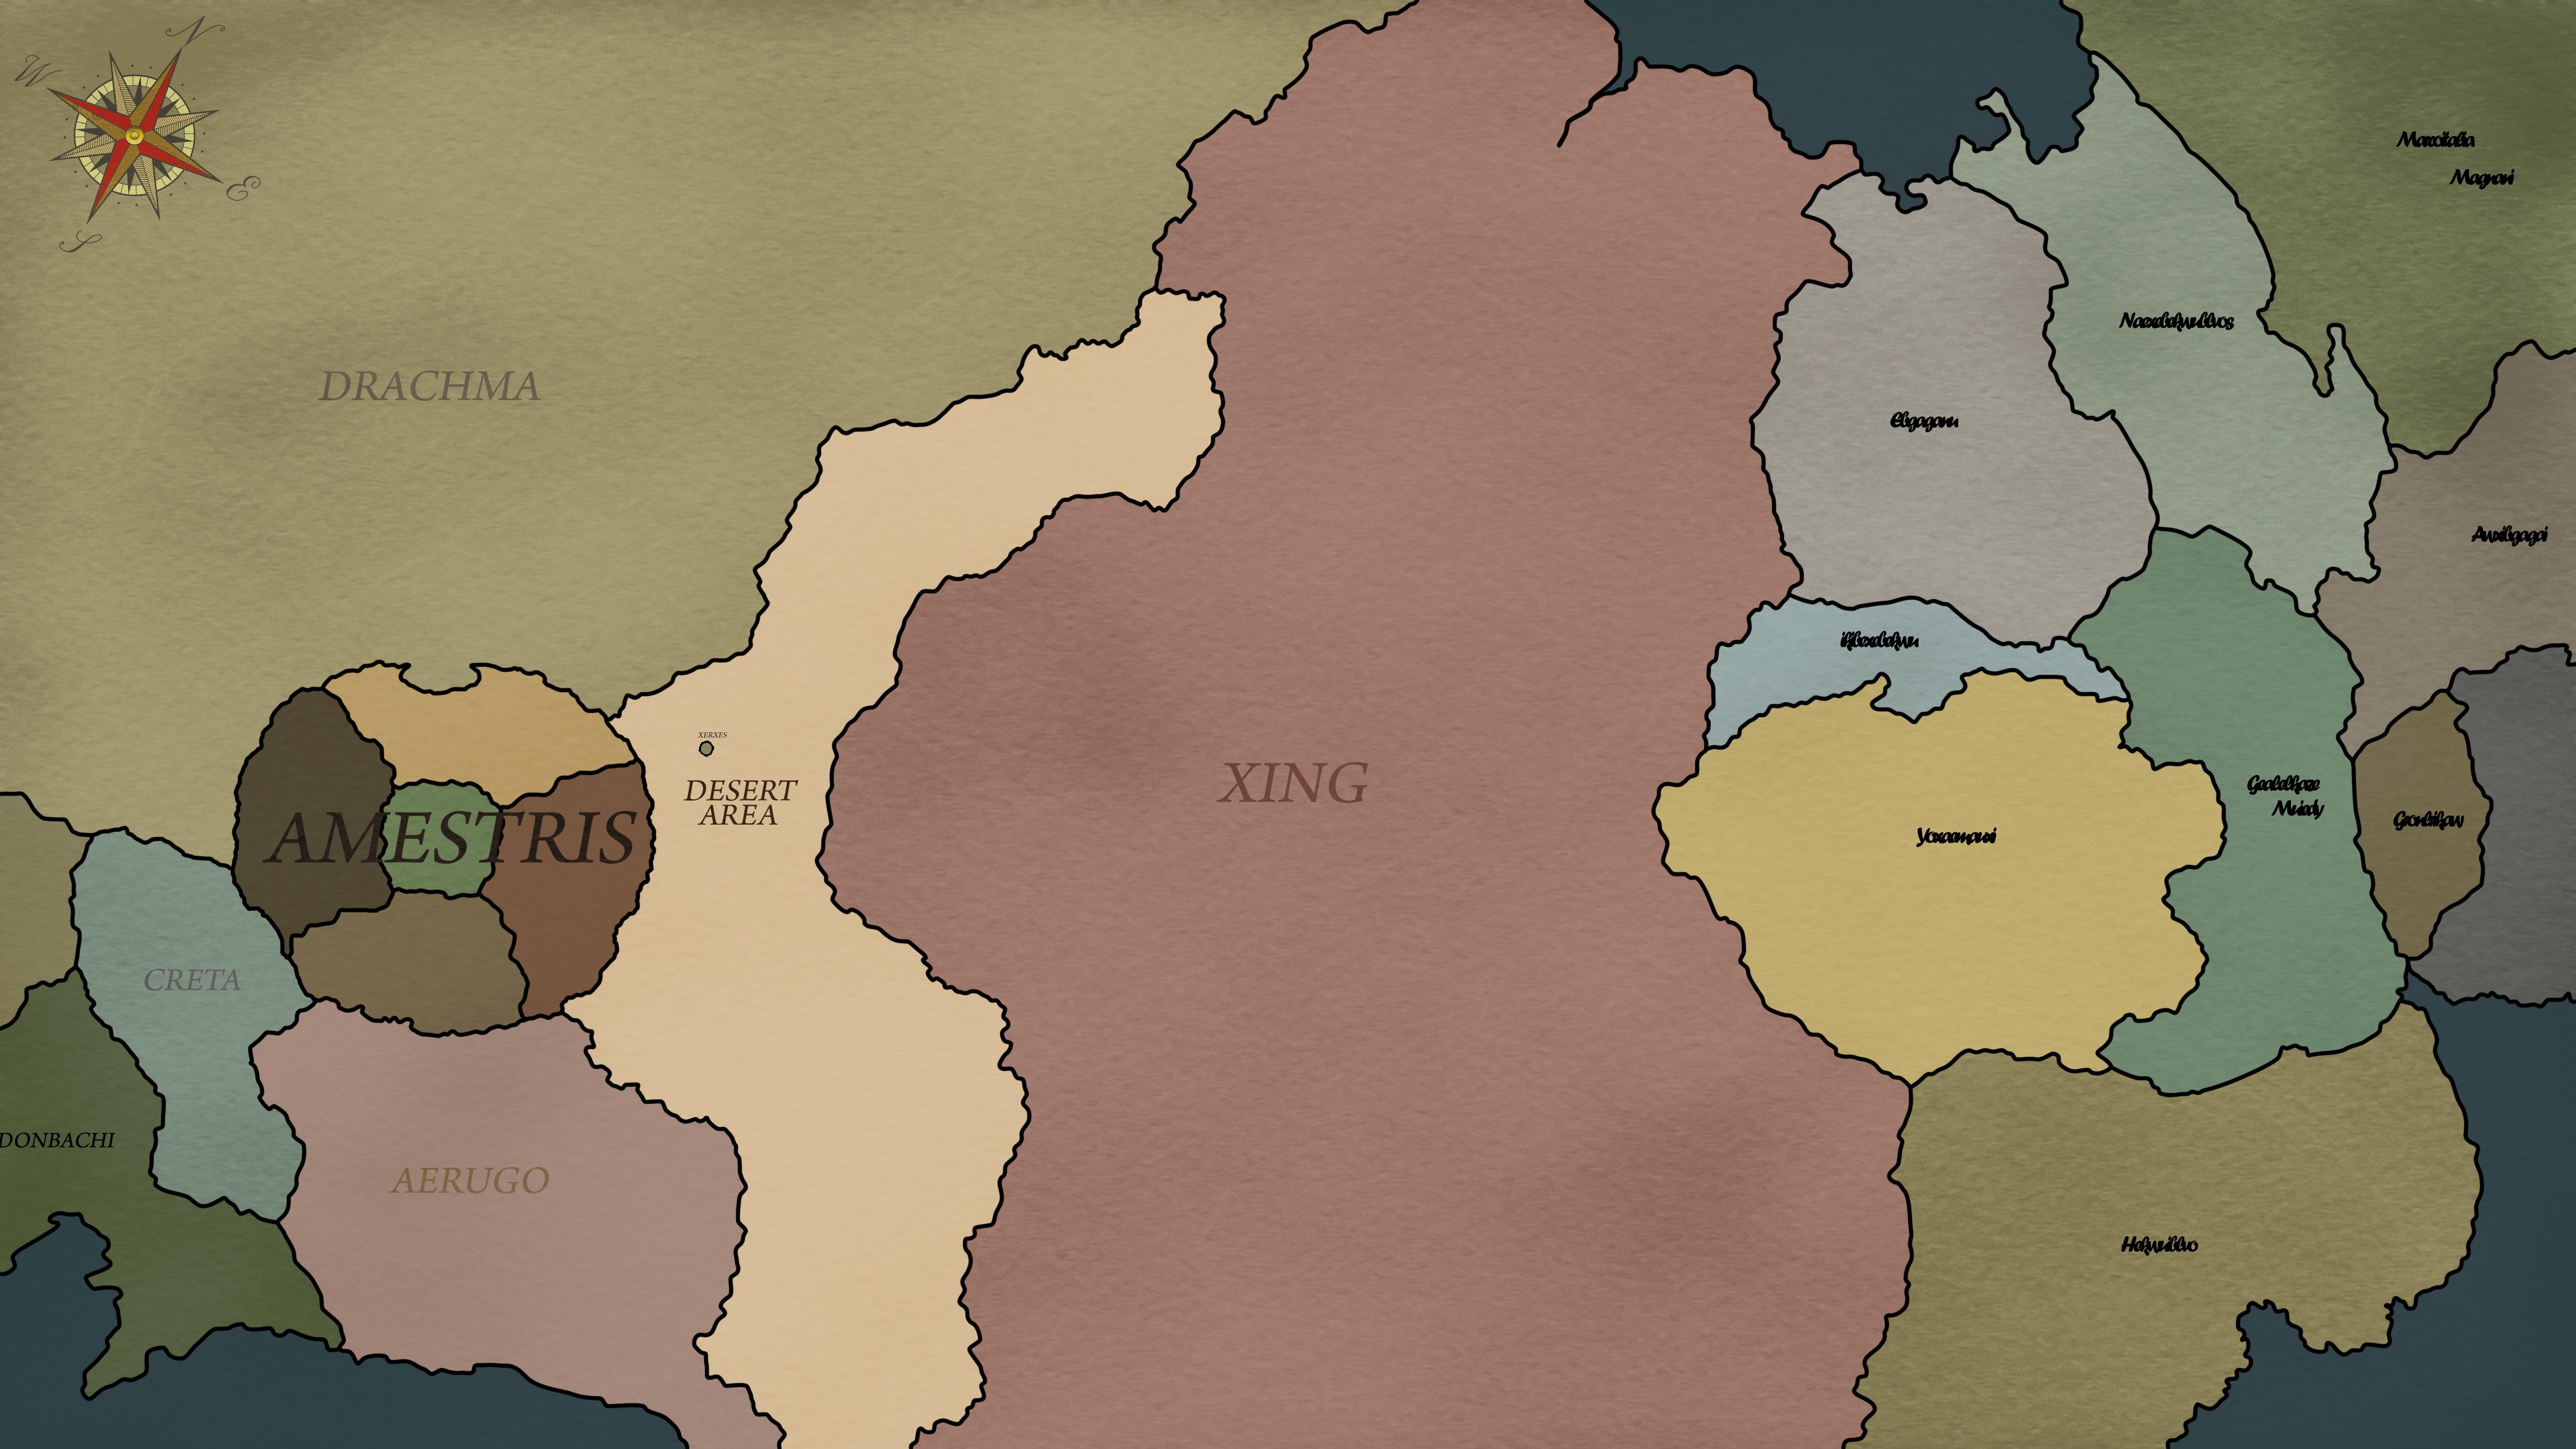 Fullmetal Alchemist World Map New Amestris Map by PosterMasterChef on DeviantArt